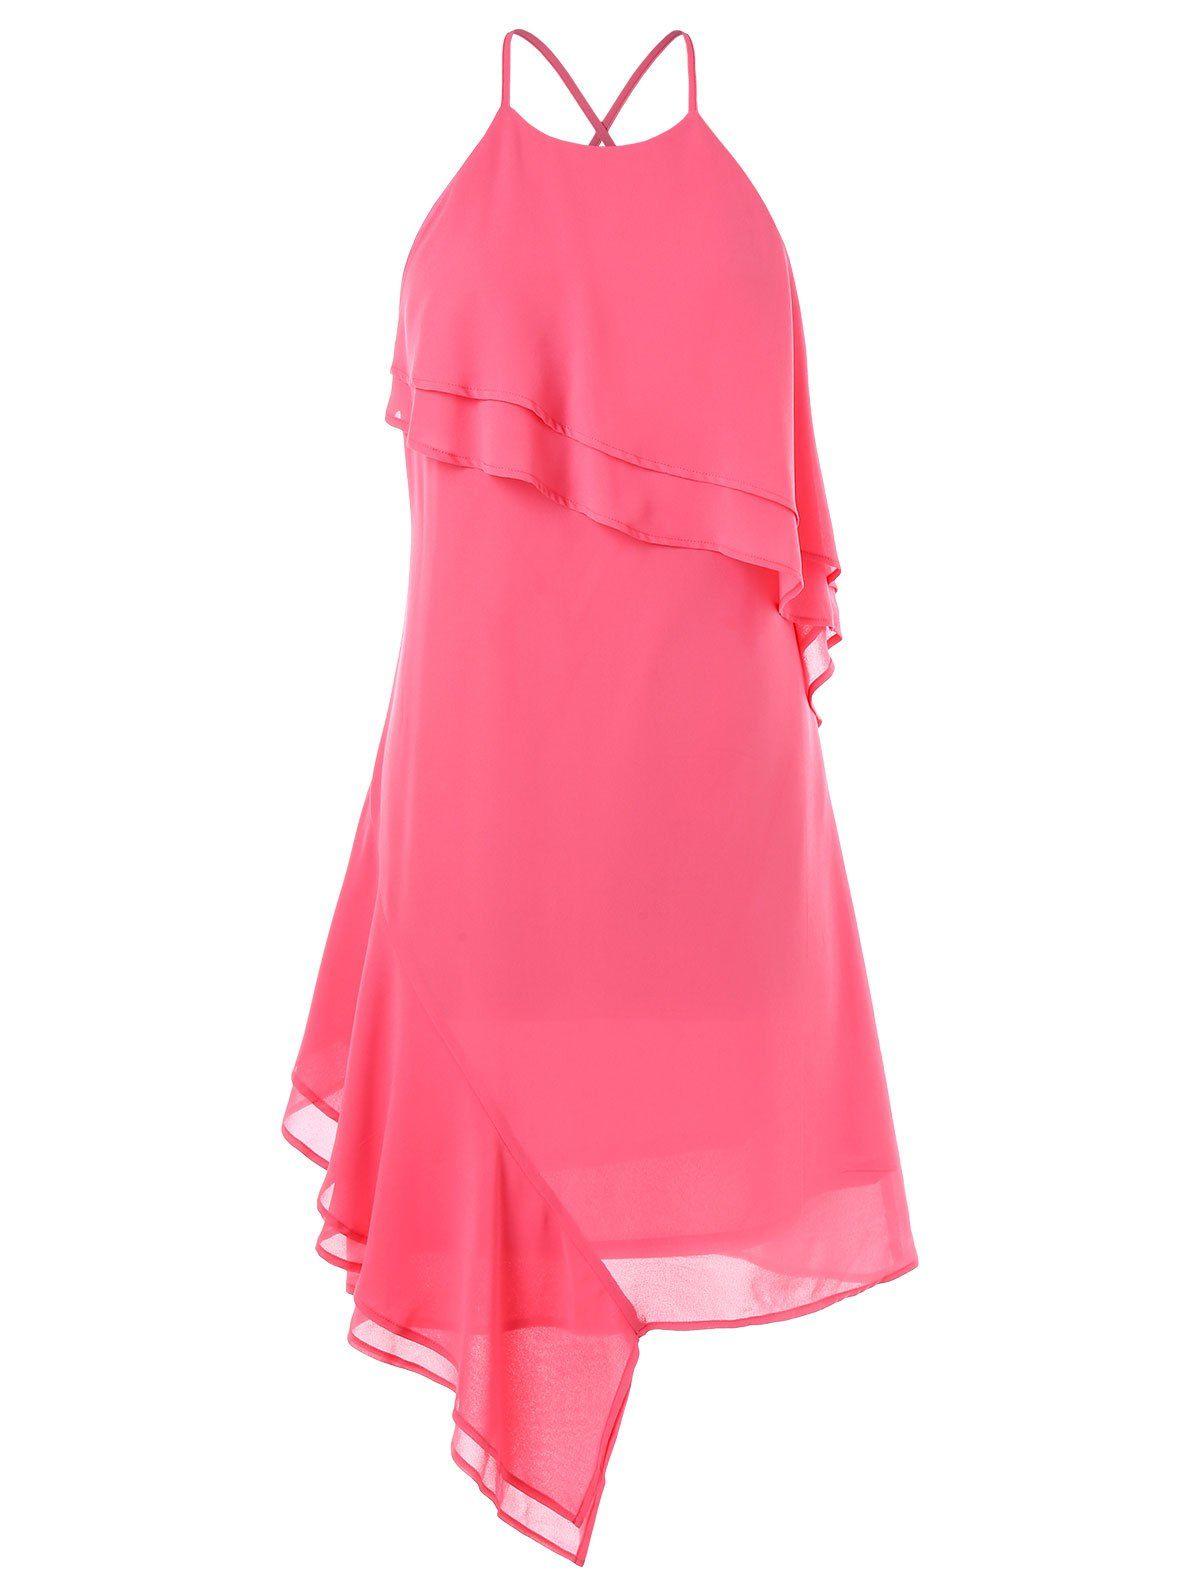 37161f25ea4d High Waisted Spaghetti Strap Chiffon Dress - RED WINE S | WOMEN'S FASHION  OF ALL KIND | Pinterest | Dresses, Chiffon Dress and Fashion